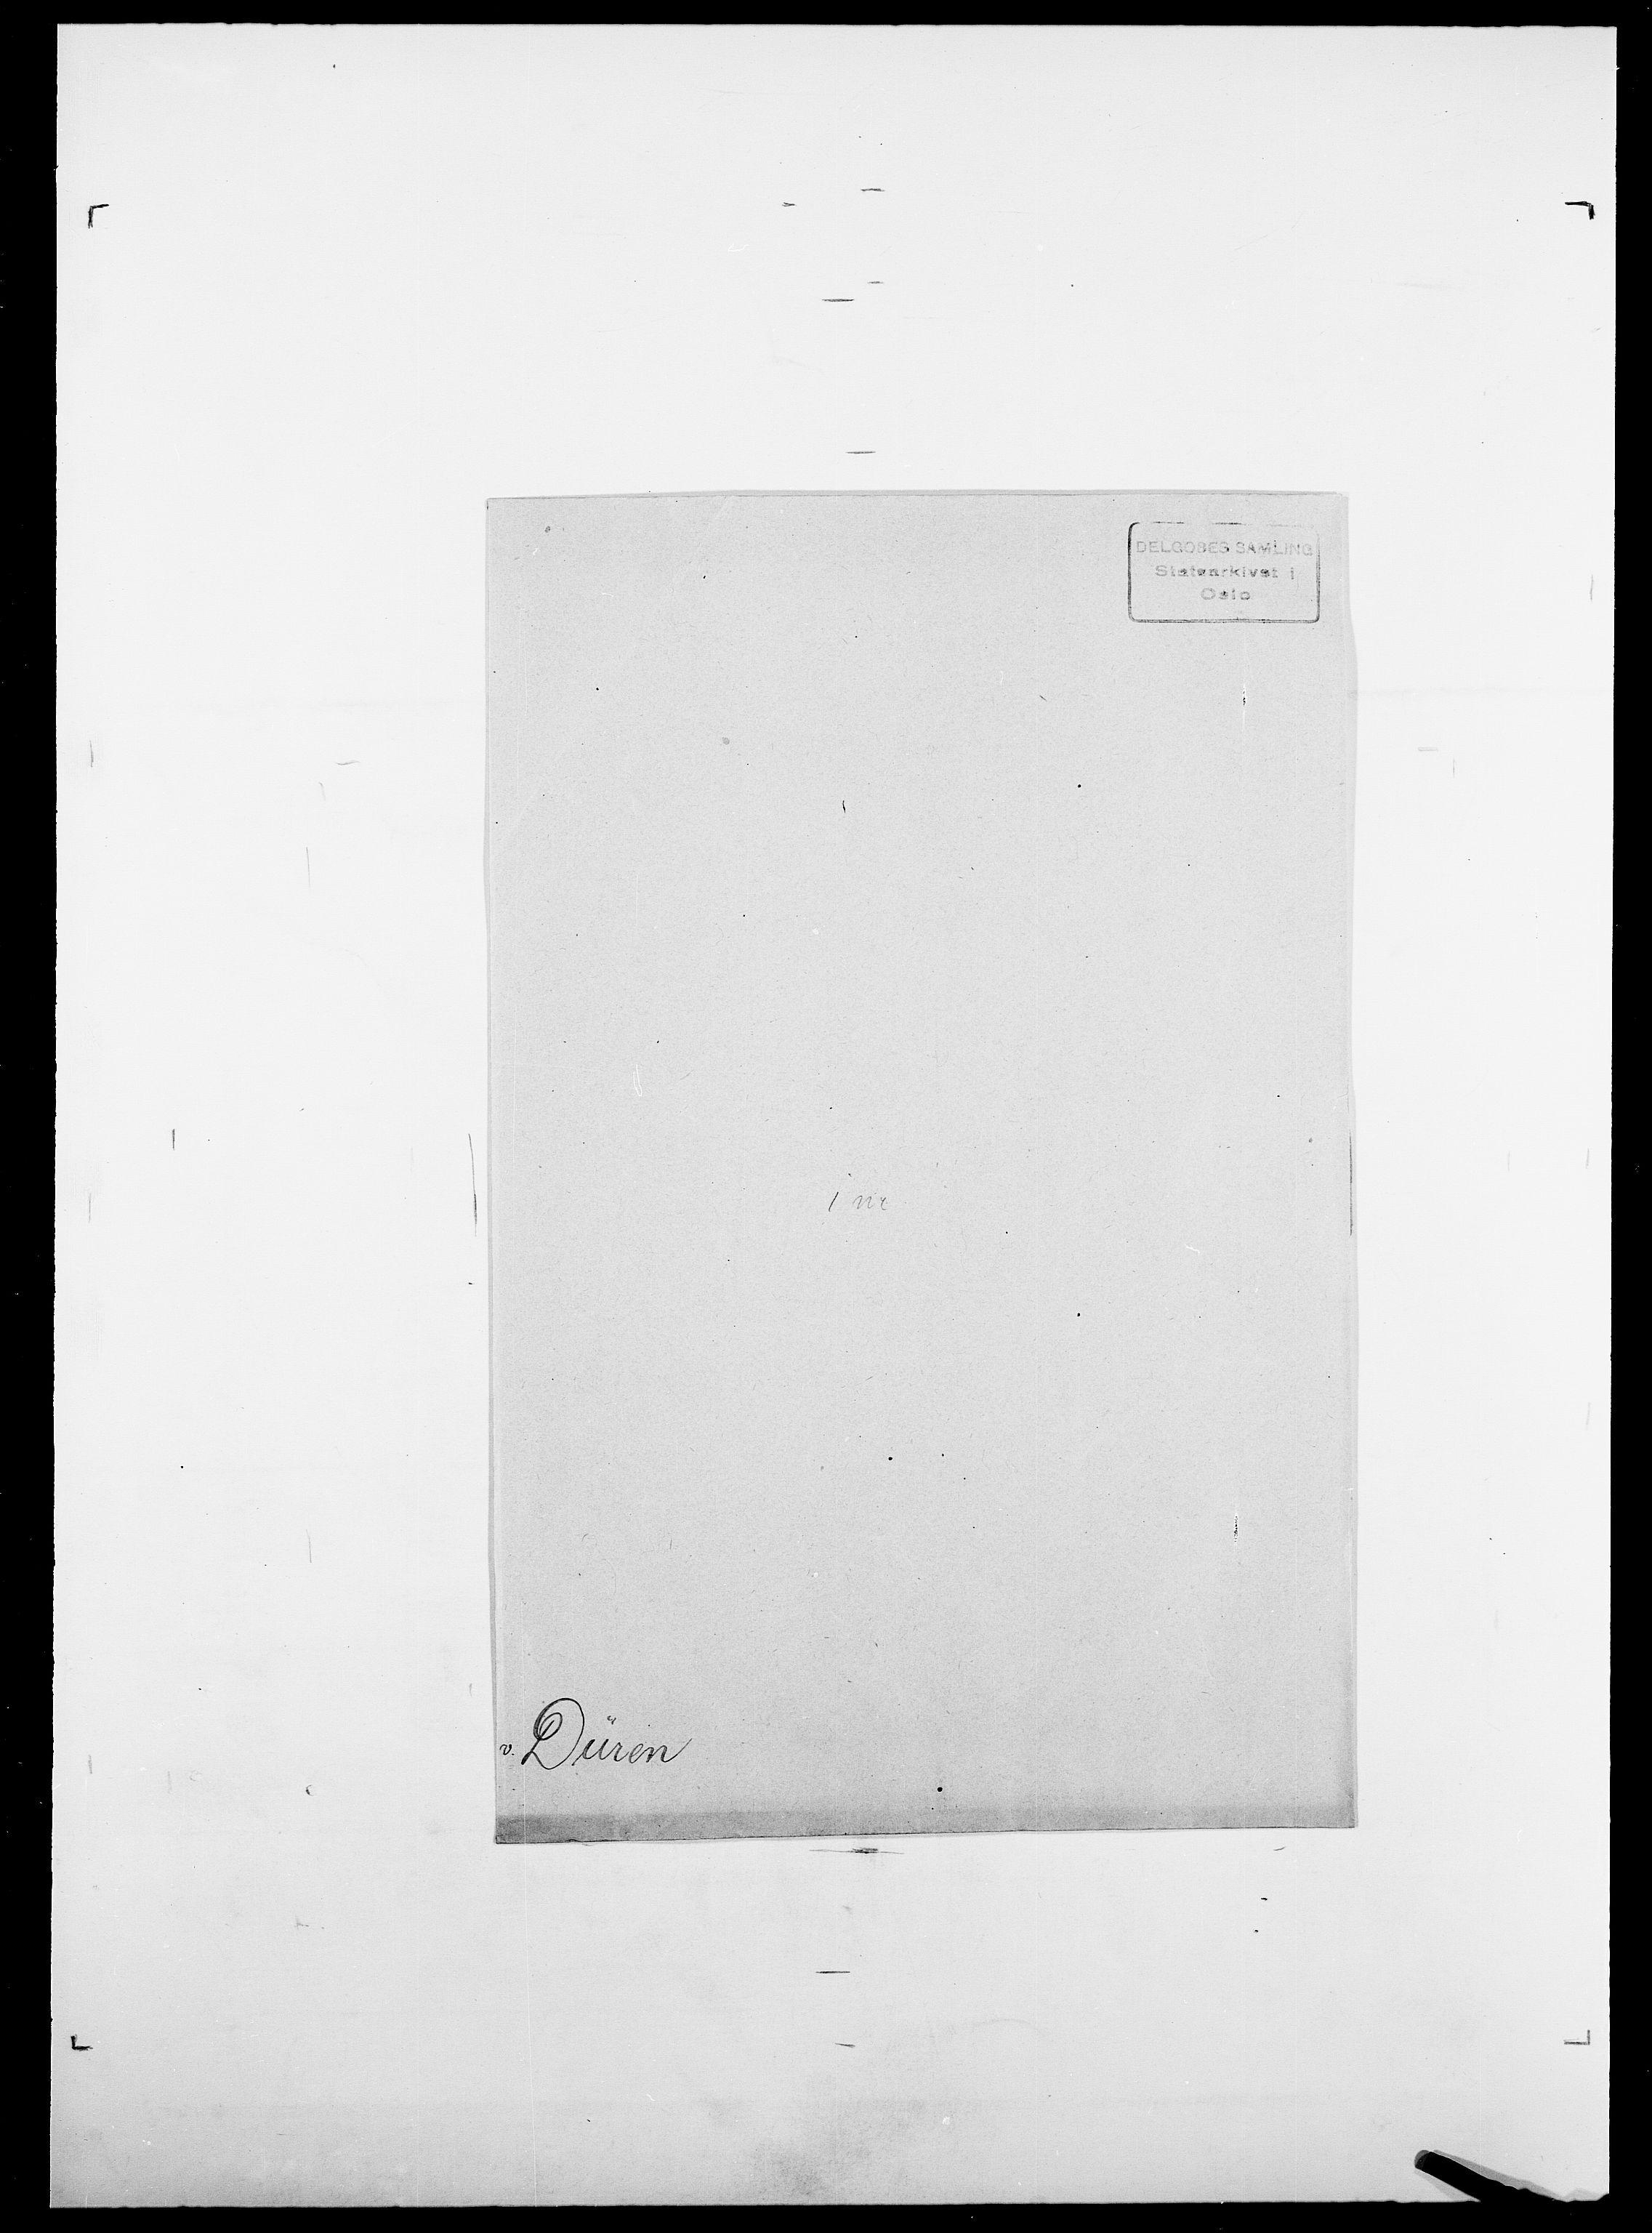 SAO, Delgobe, Charles Antoine - samling, D/Da/L0009: Dahl - v. Düren, s. 908